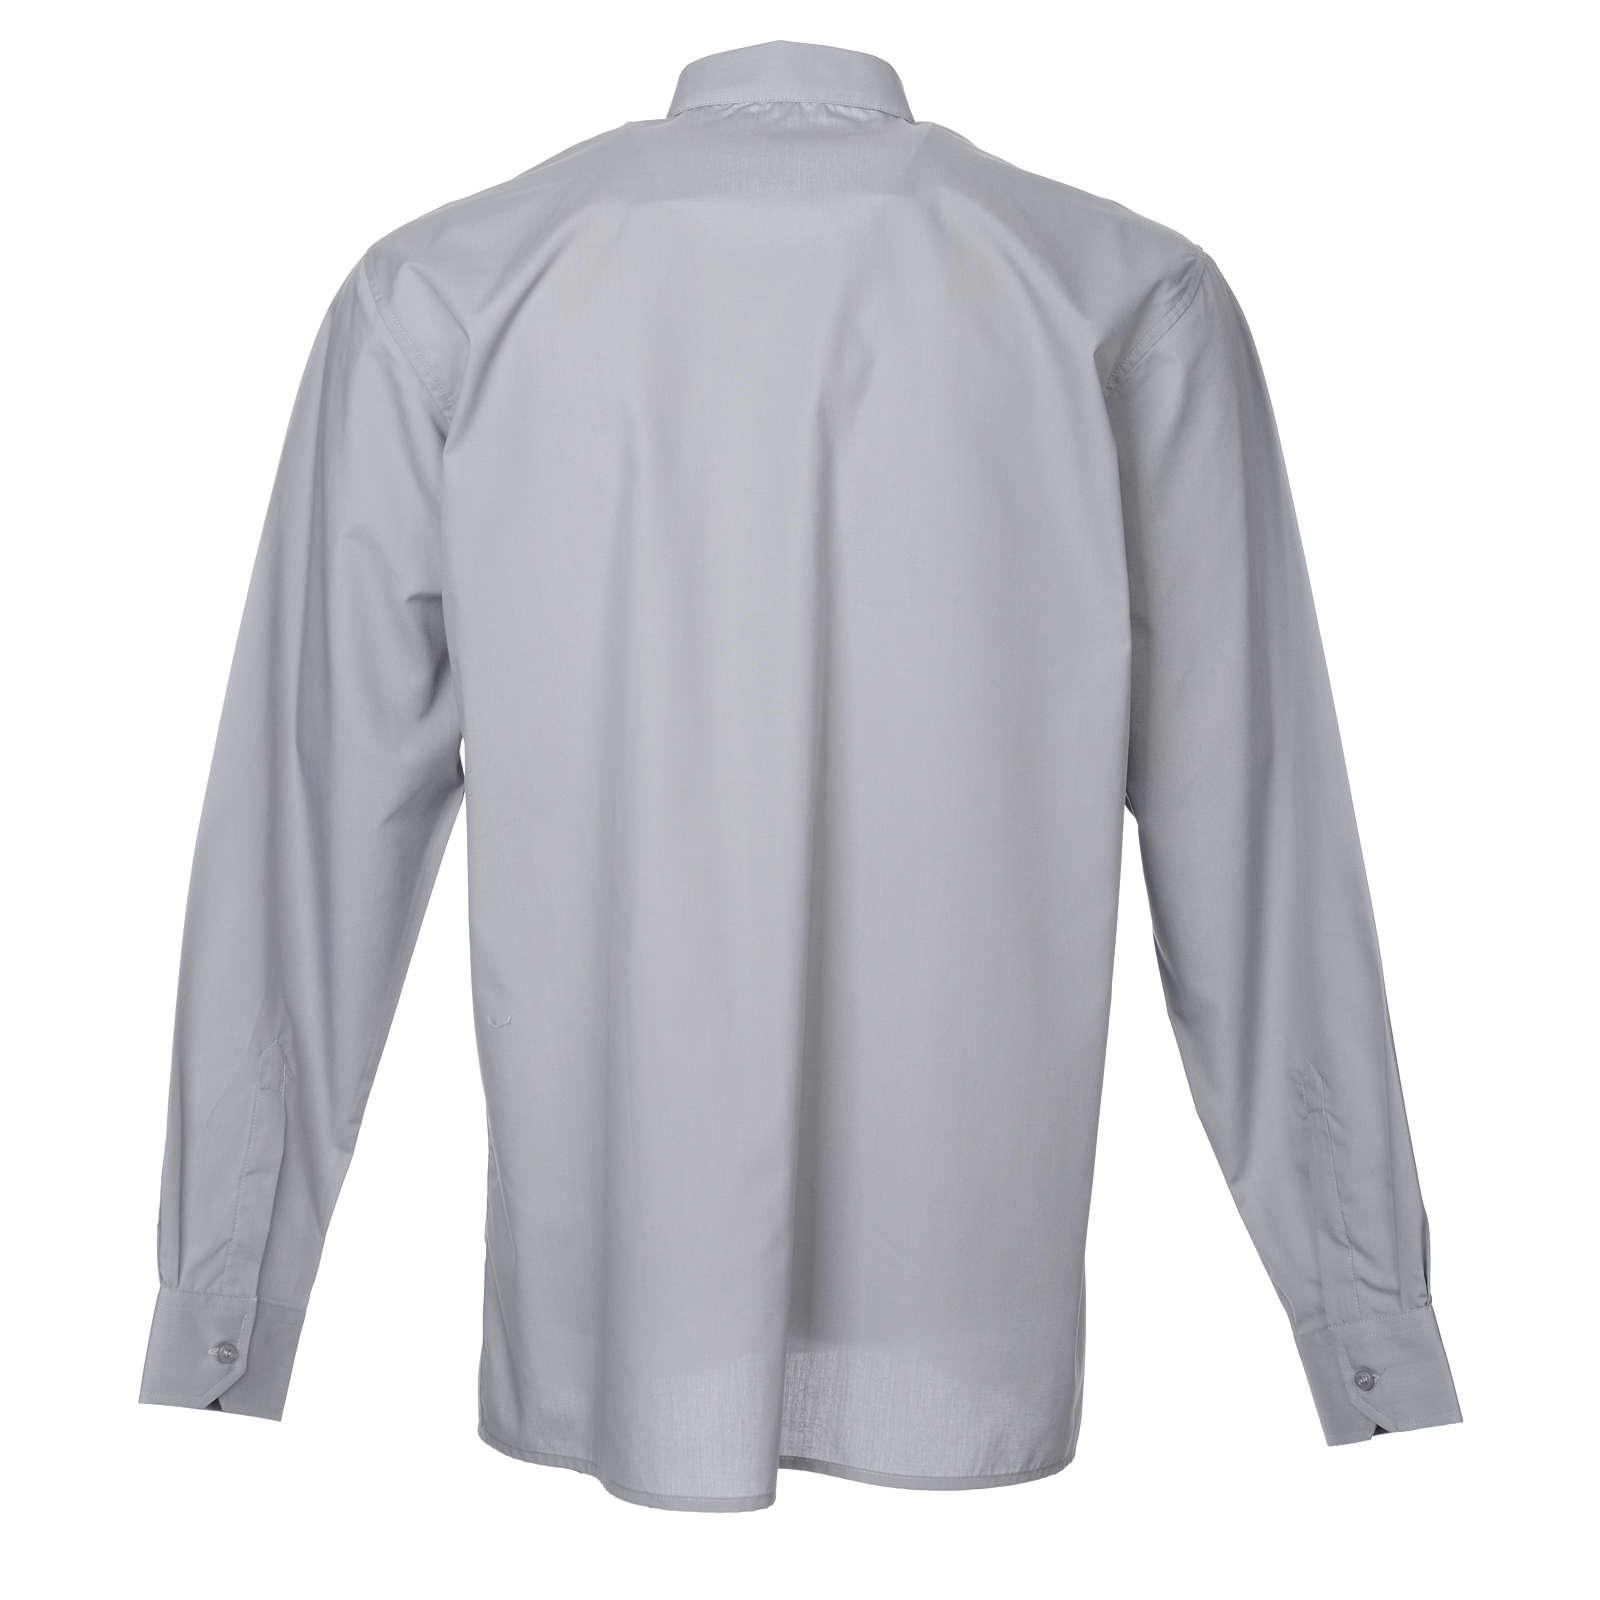 STOCK Camisa clergy manga larga  mixto gris claro 4